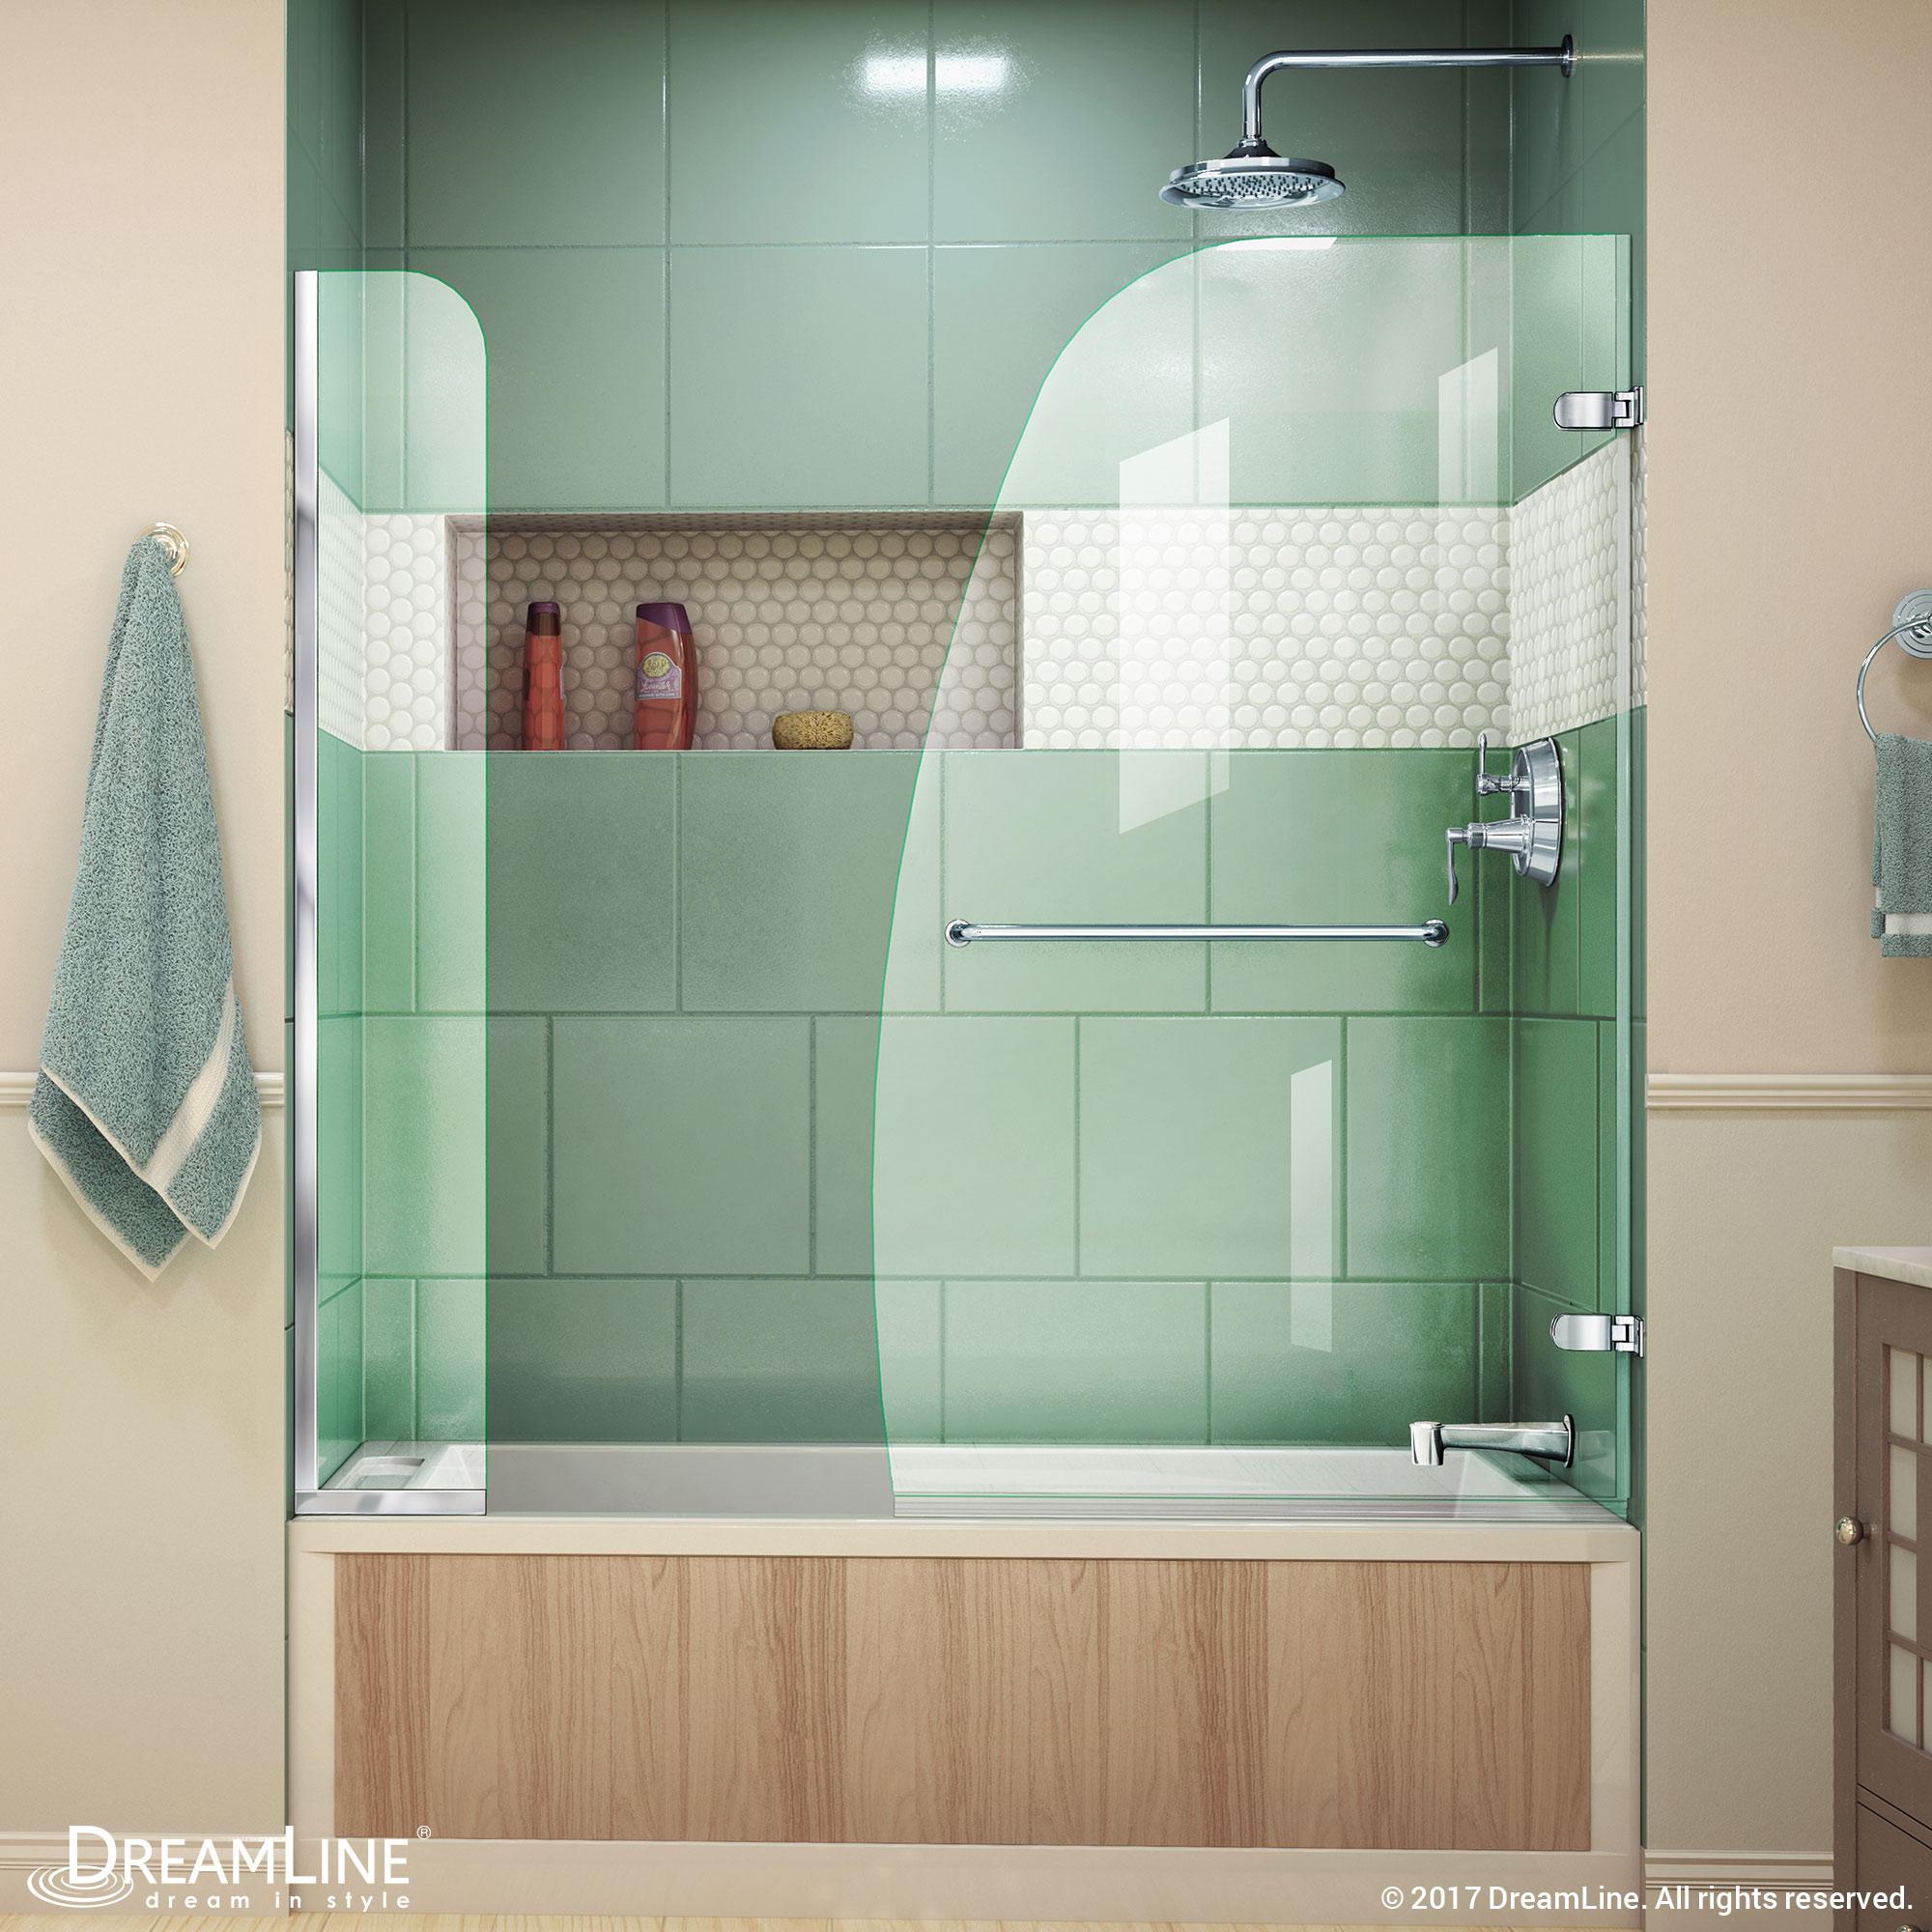 "Aqua Uno 34"" Frameless Hinged Tub Door, Clear 1/4"" Glass Door, Brushed Nickel"